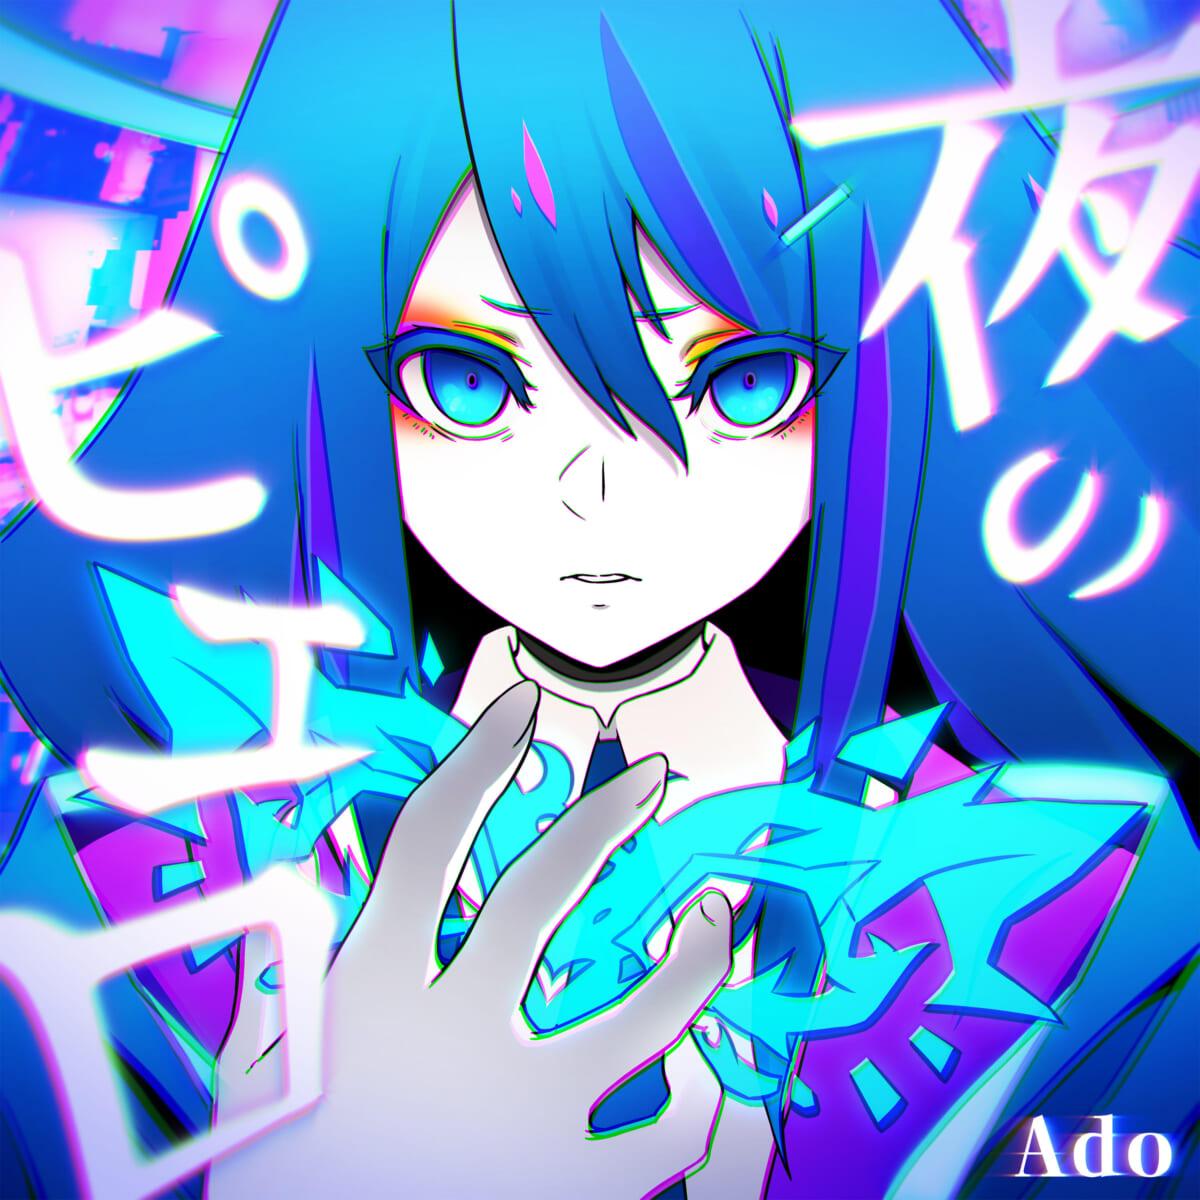 Ado「夜のピエロ」